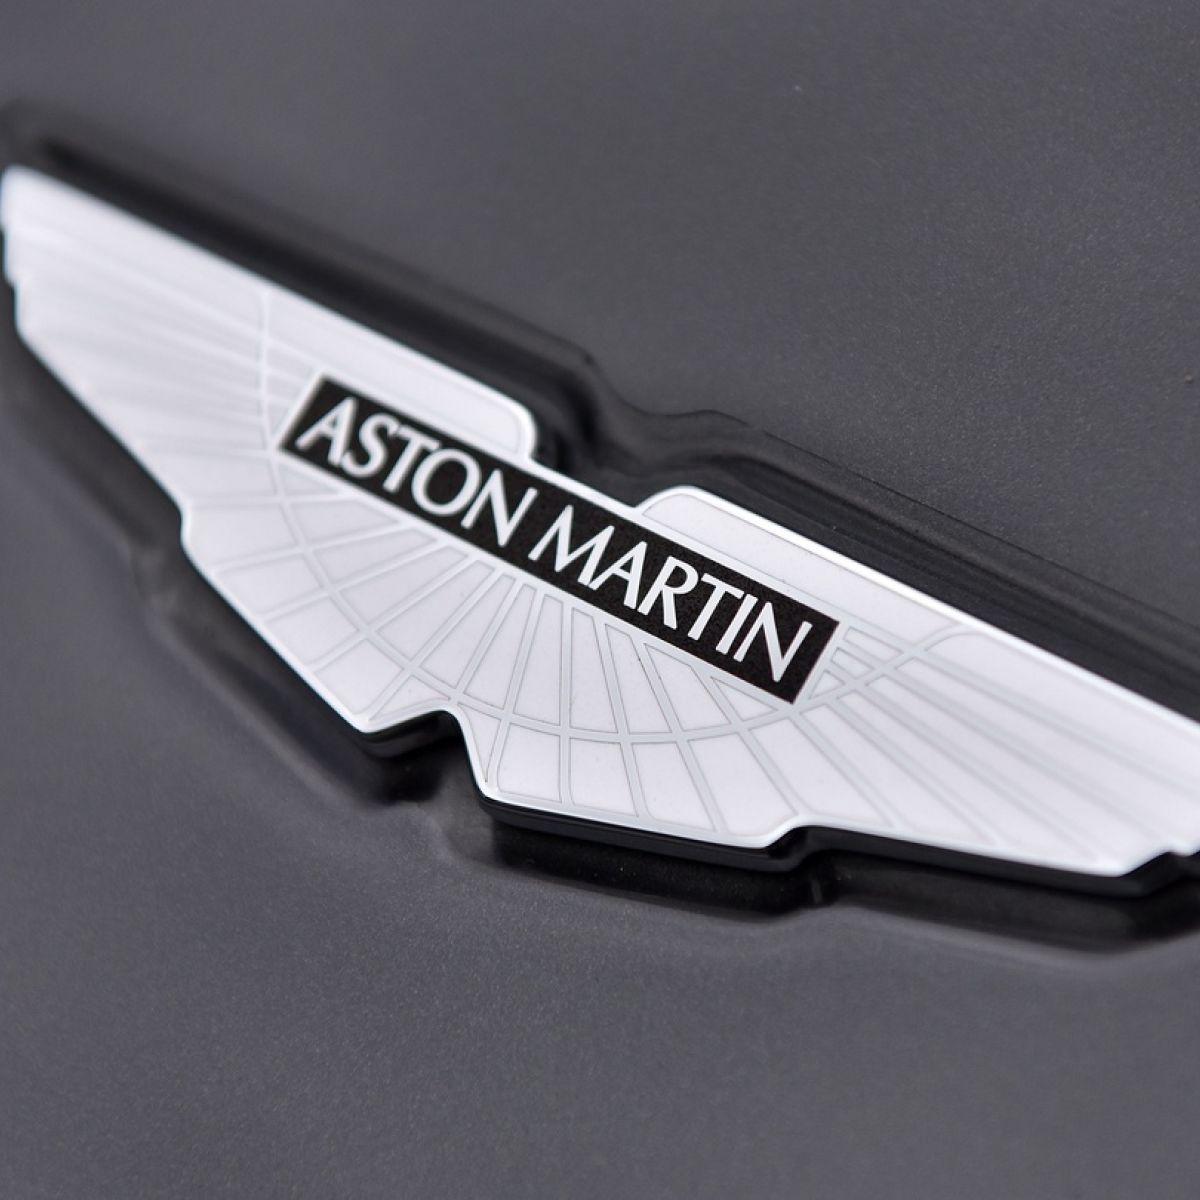 Aston Martin Considers London Ipo As Profits Hit Record Levels